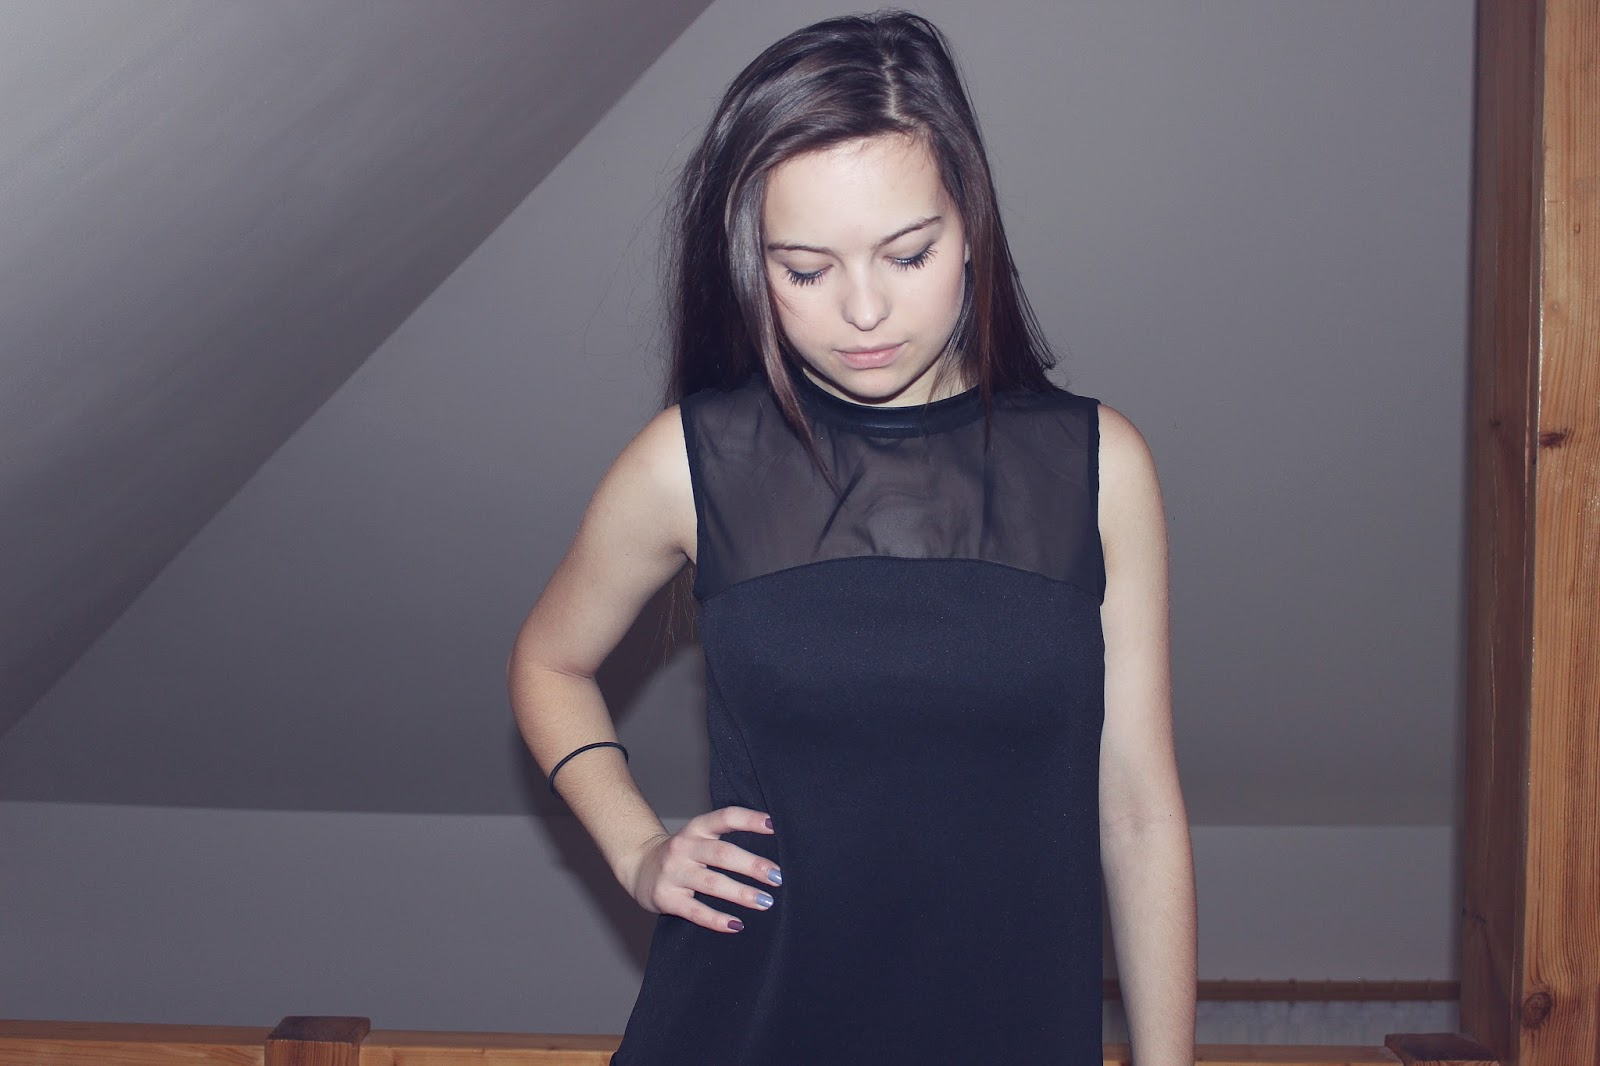 ❄ Luźna, czarna sukienka.